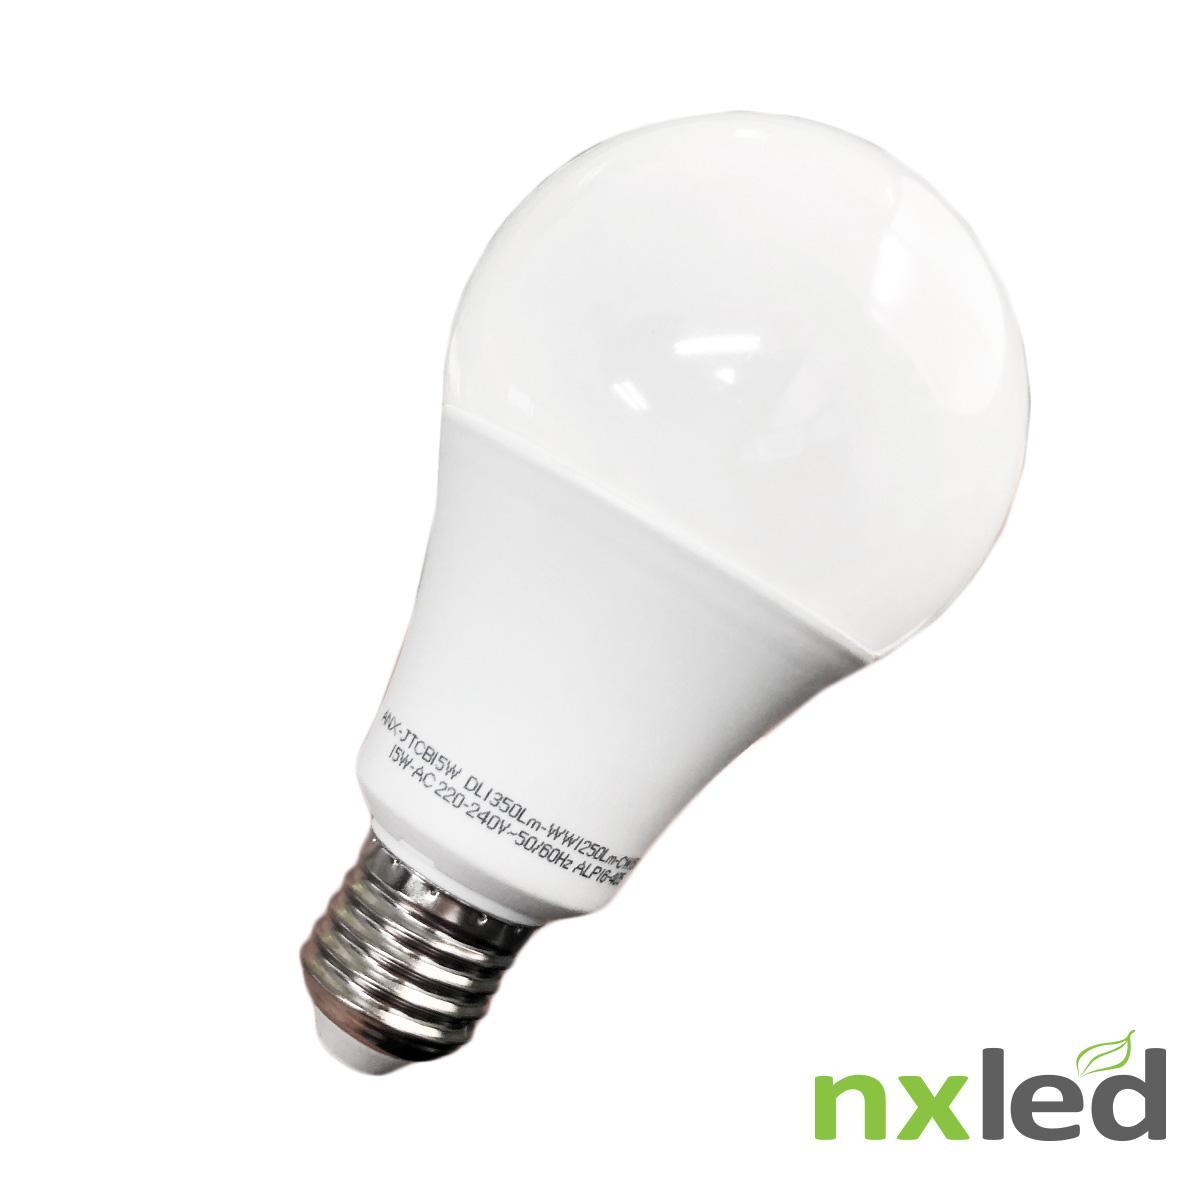 Color Led Nxled Anx Tcb15w Bulb Tri c3q45LARj